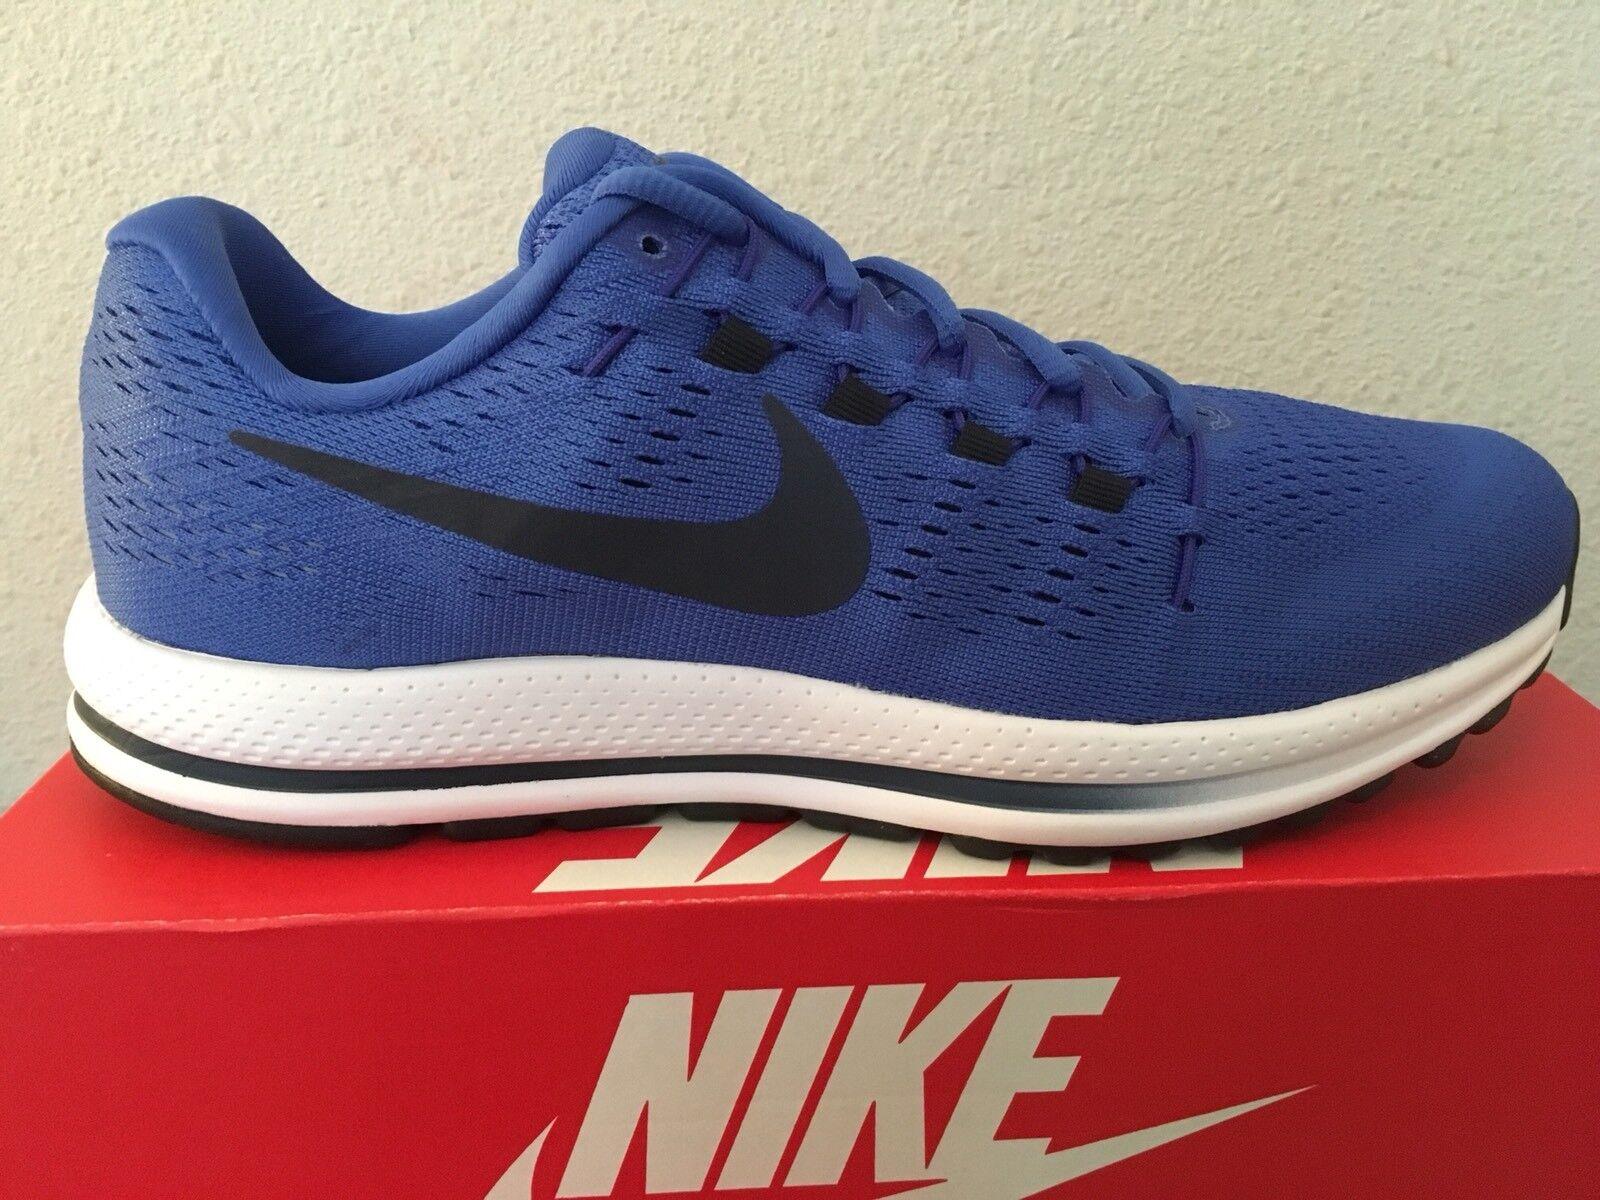 nike 12 air zoom vomero chaussures bleu noir de 12 nike hommes 863762 407 taille 10, 10,5 8471c2